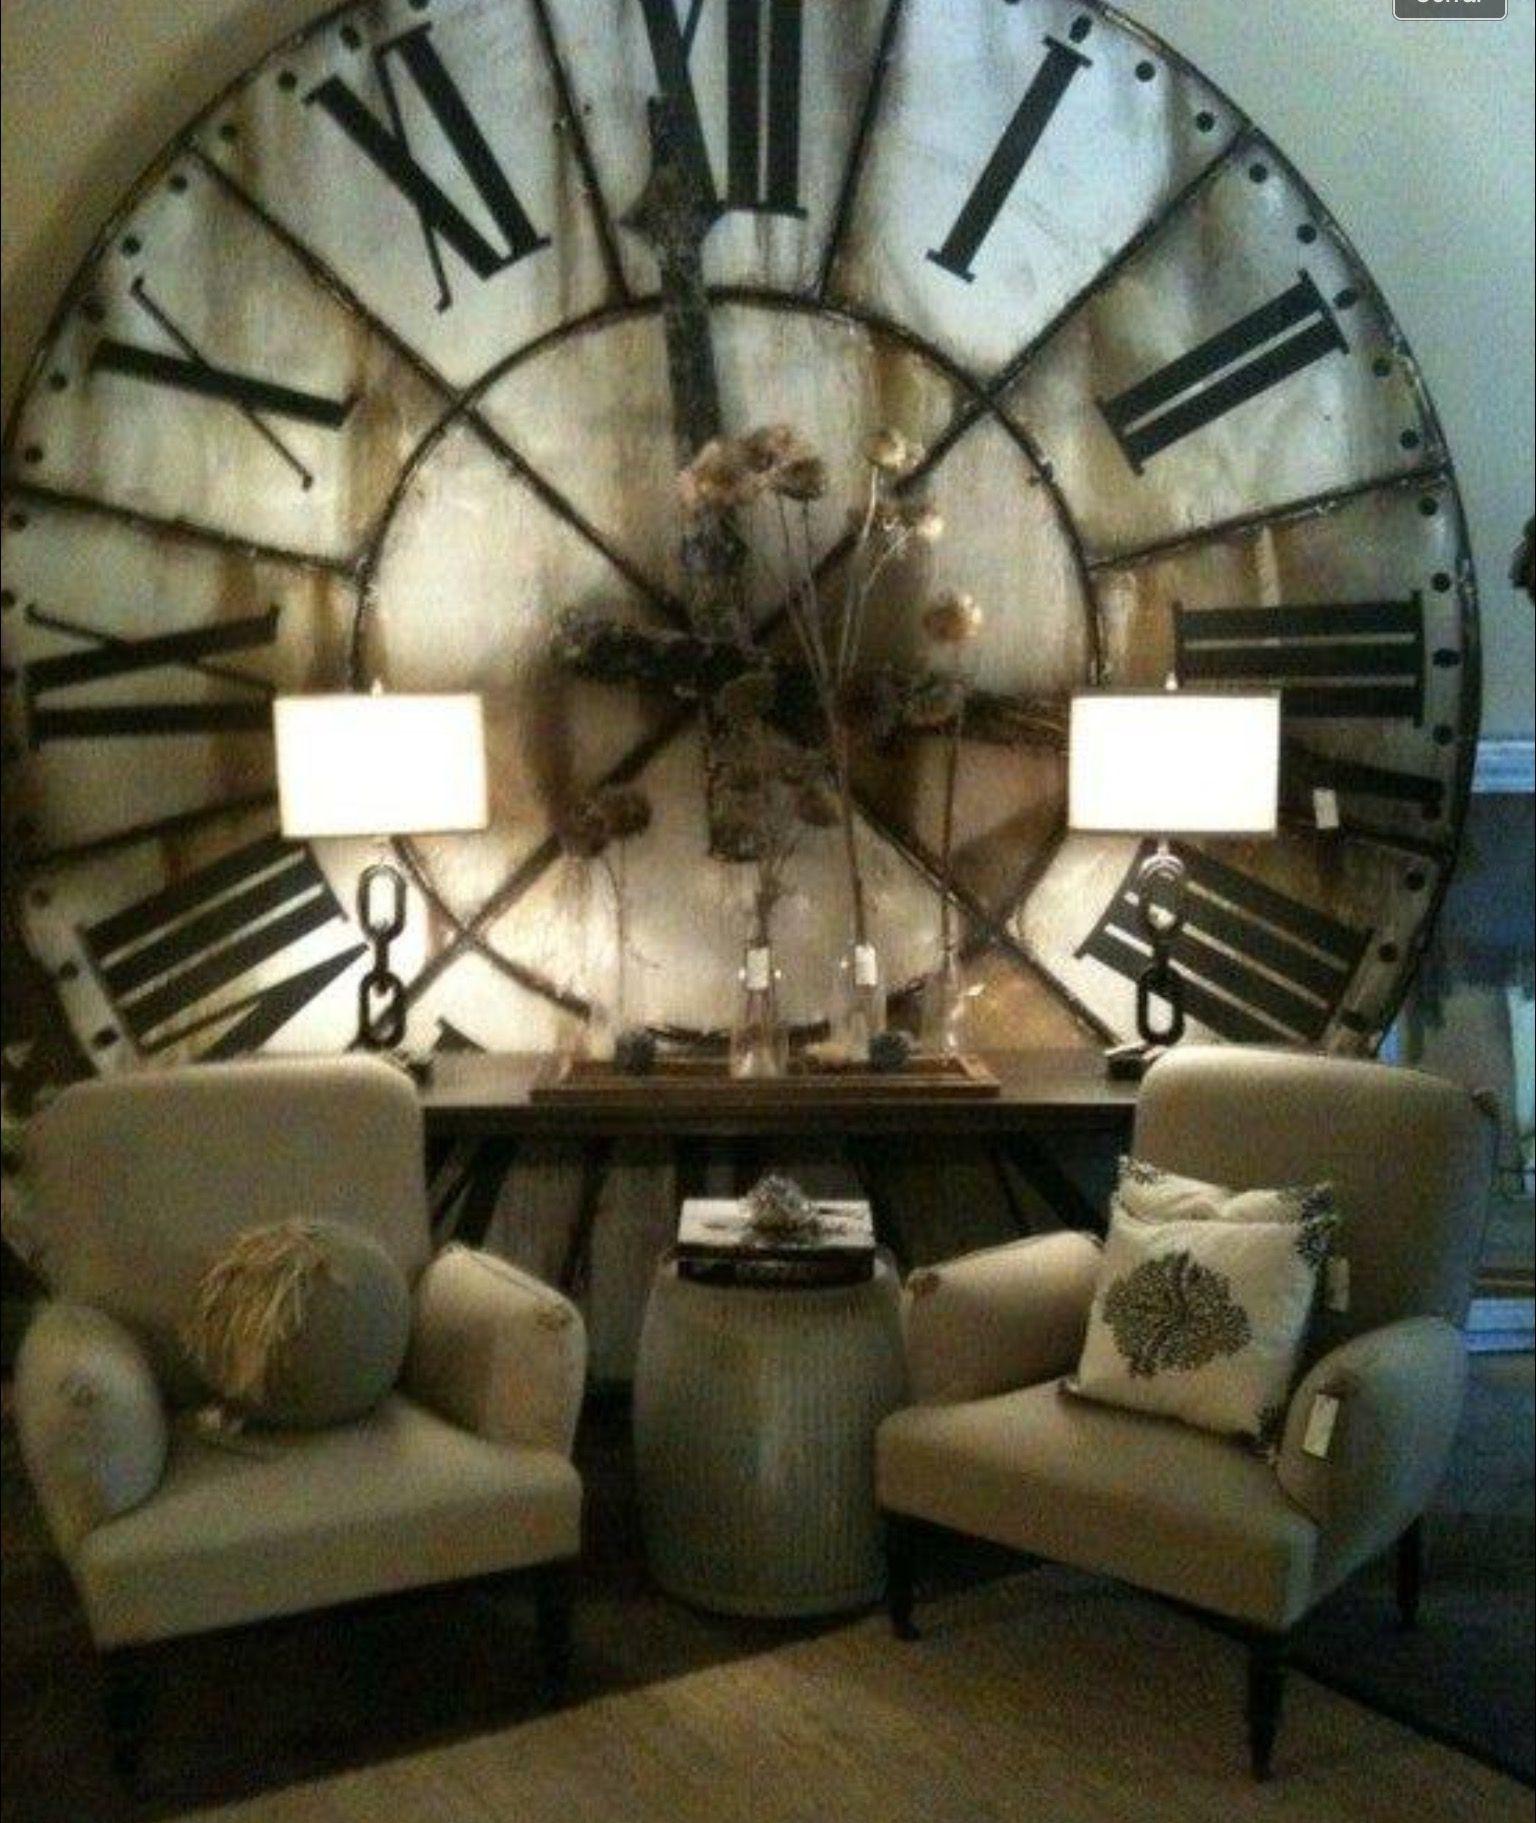 Big Round Wall Clocks Ideas On Foter